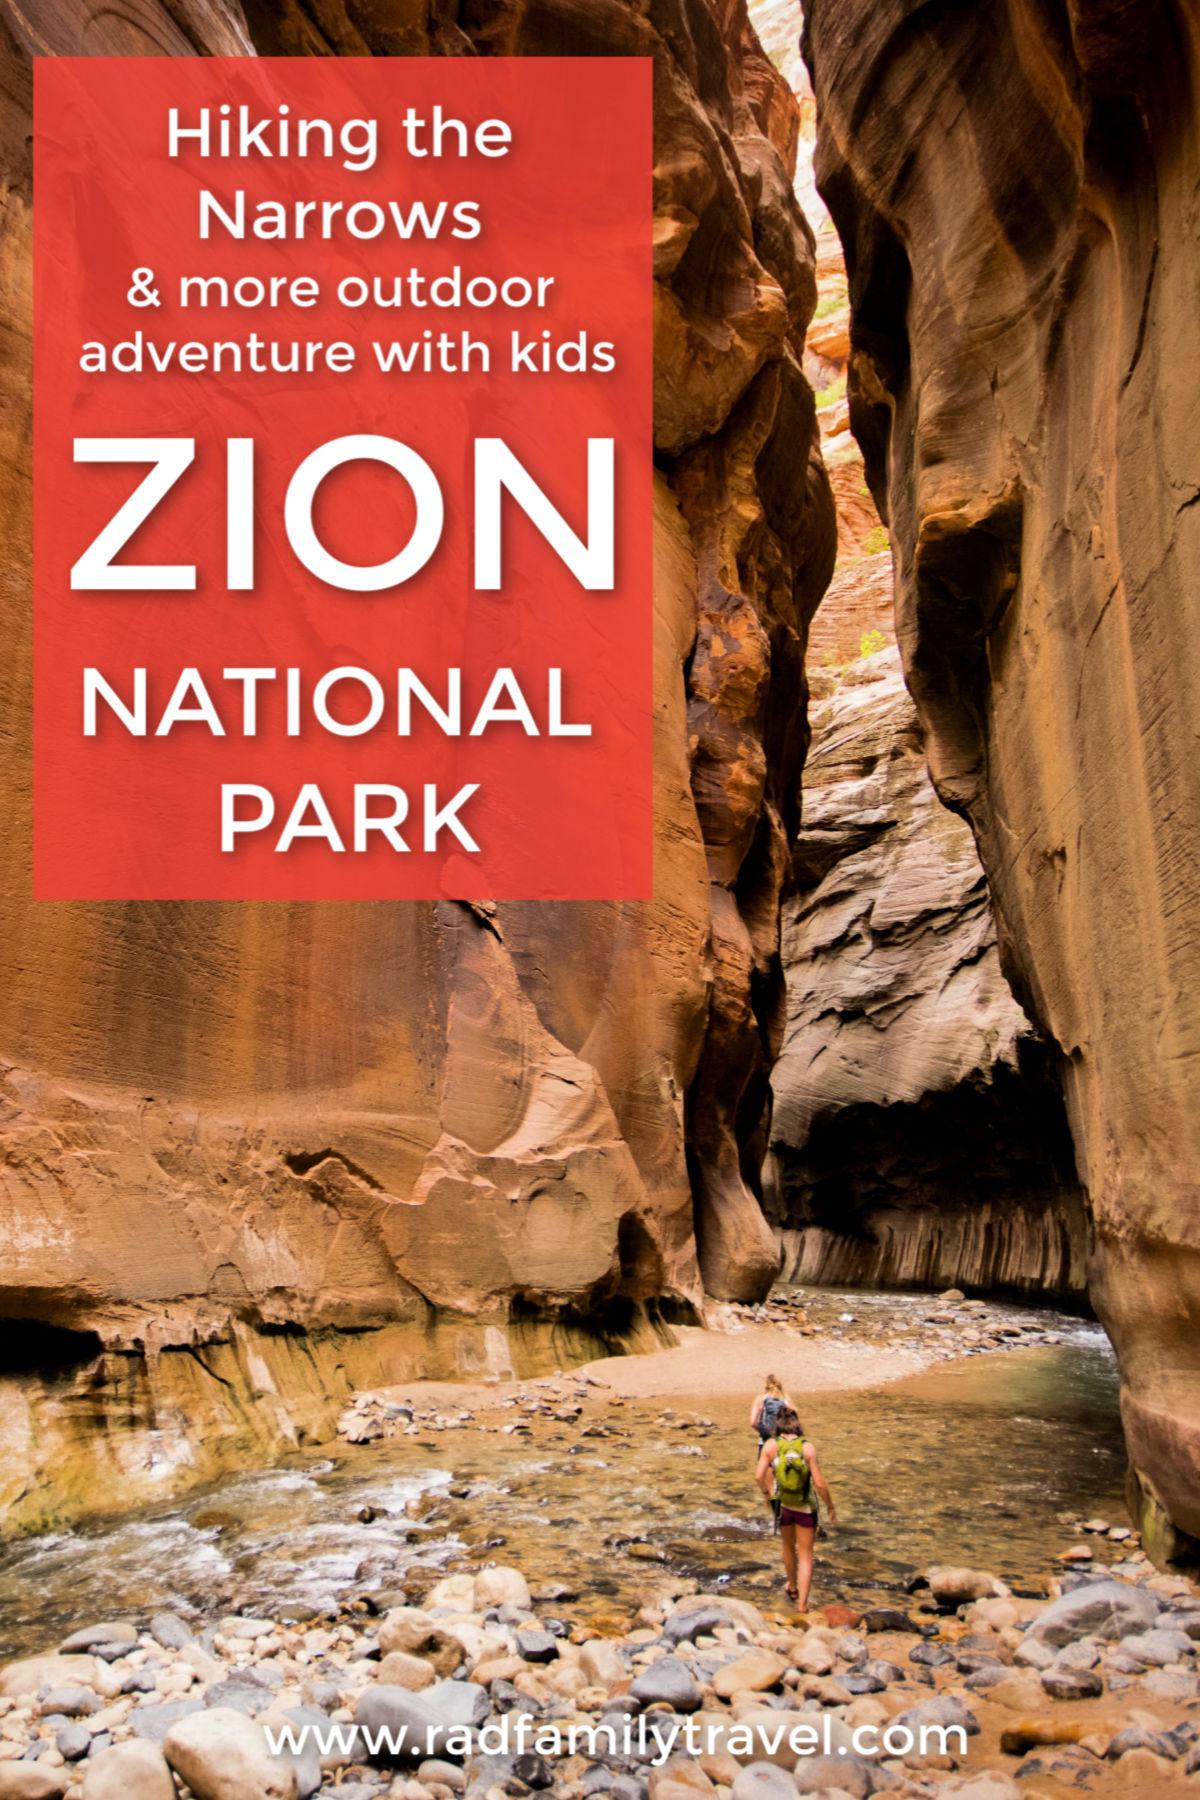 outdoor-adventure-kids-zion-national-park